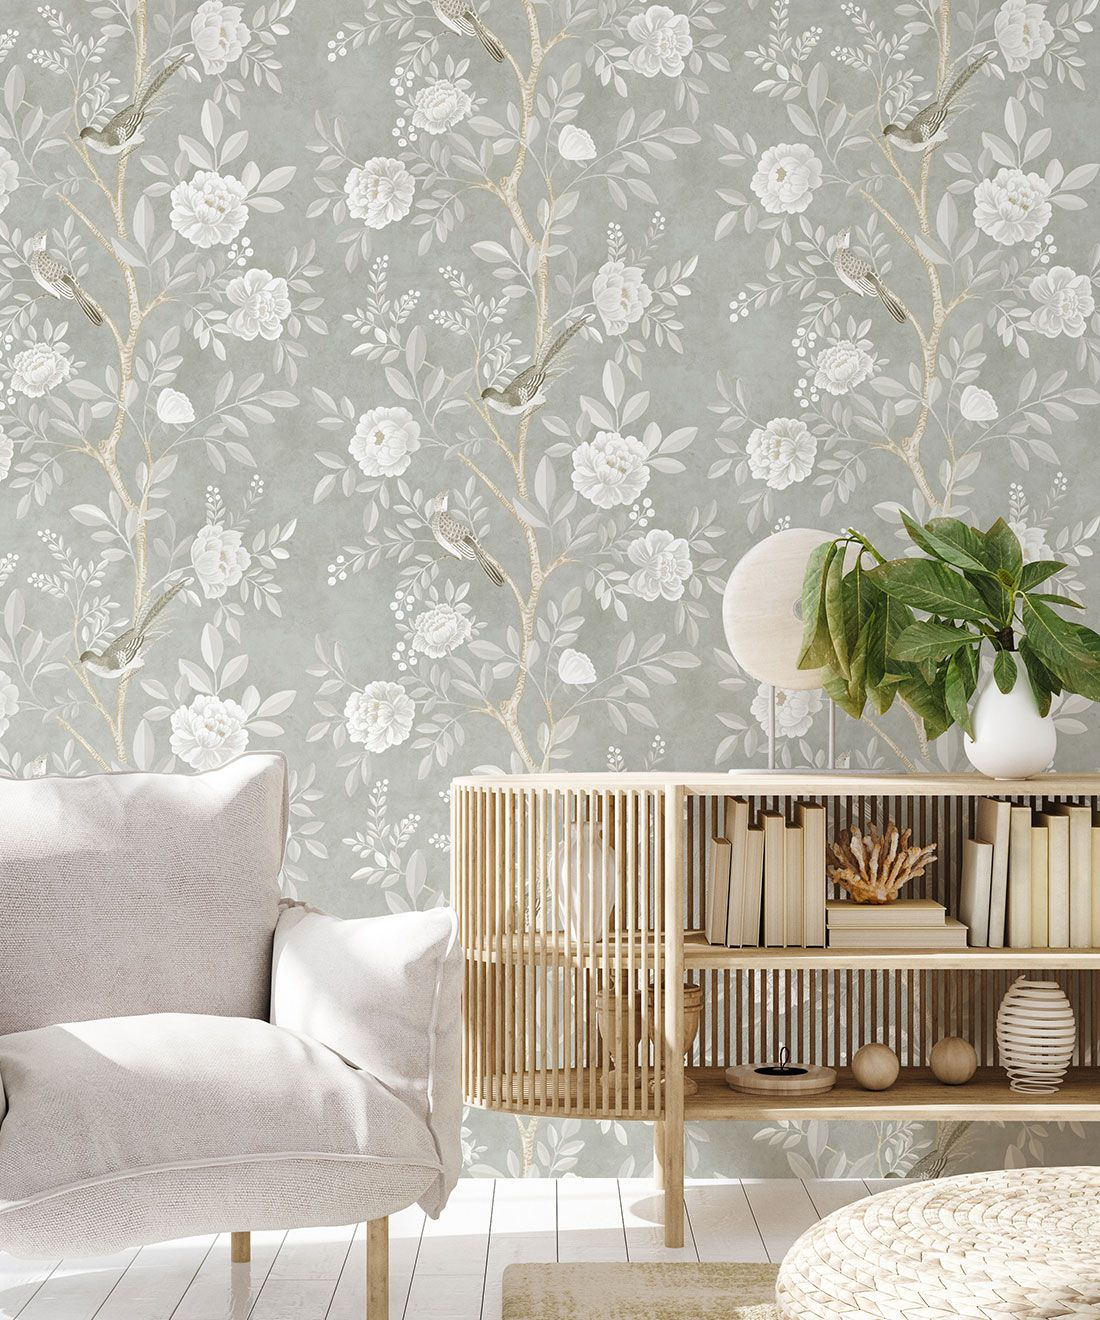 Chinoiserie Wallpaper •Floral Wallpaper •Bird Wallpaper • Magnolia • Linen • Insitu